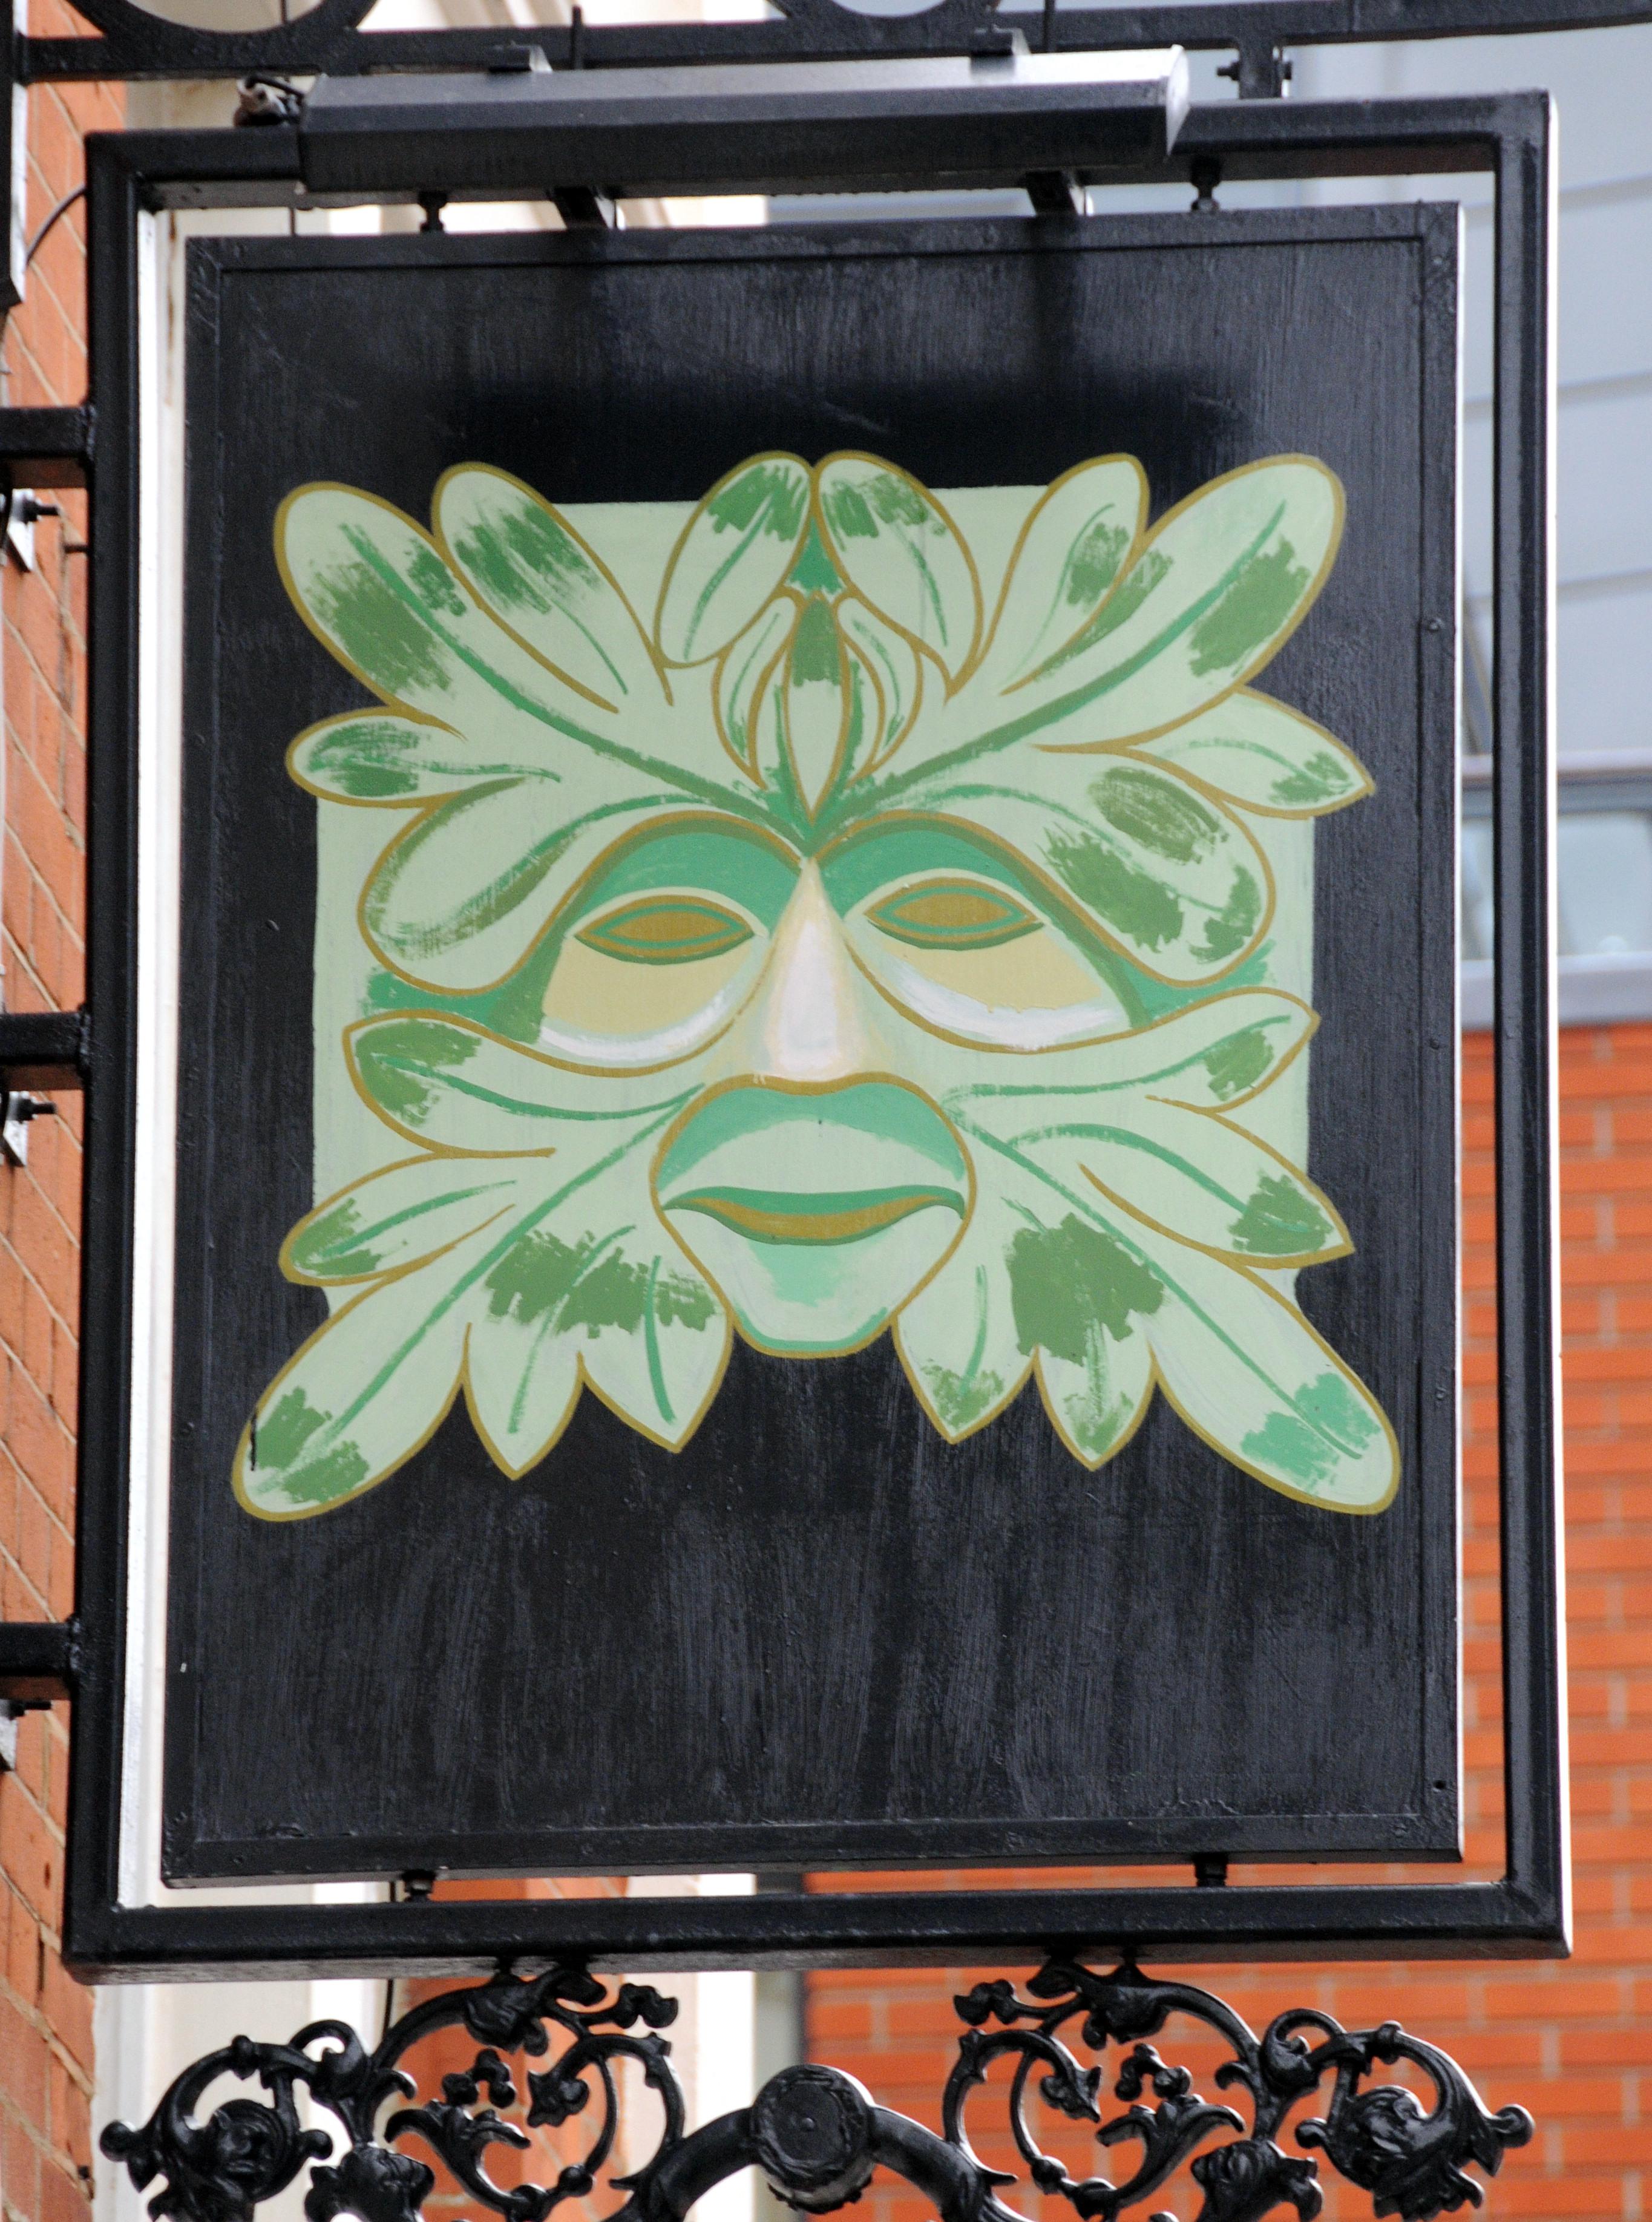 Pub sign depicting pagan Green Man.